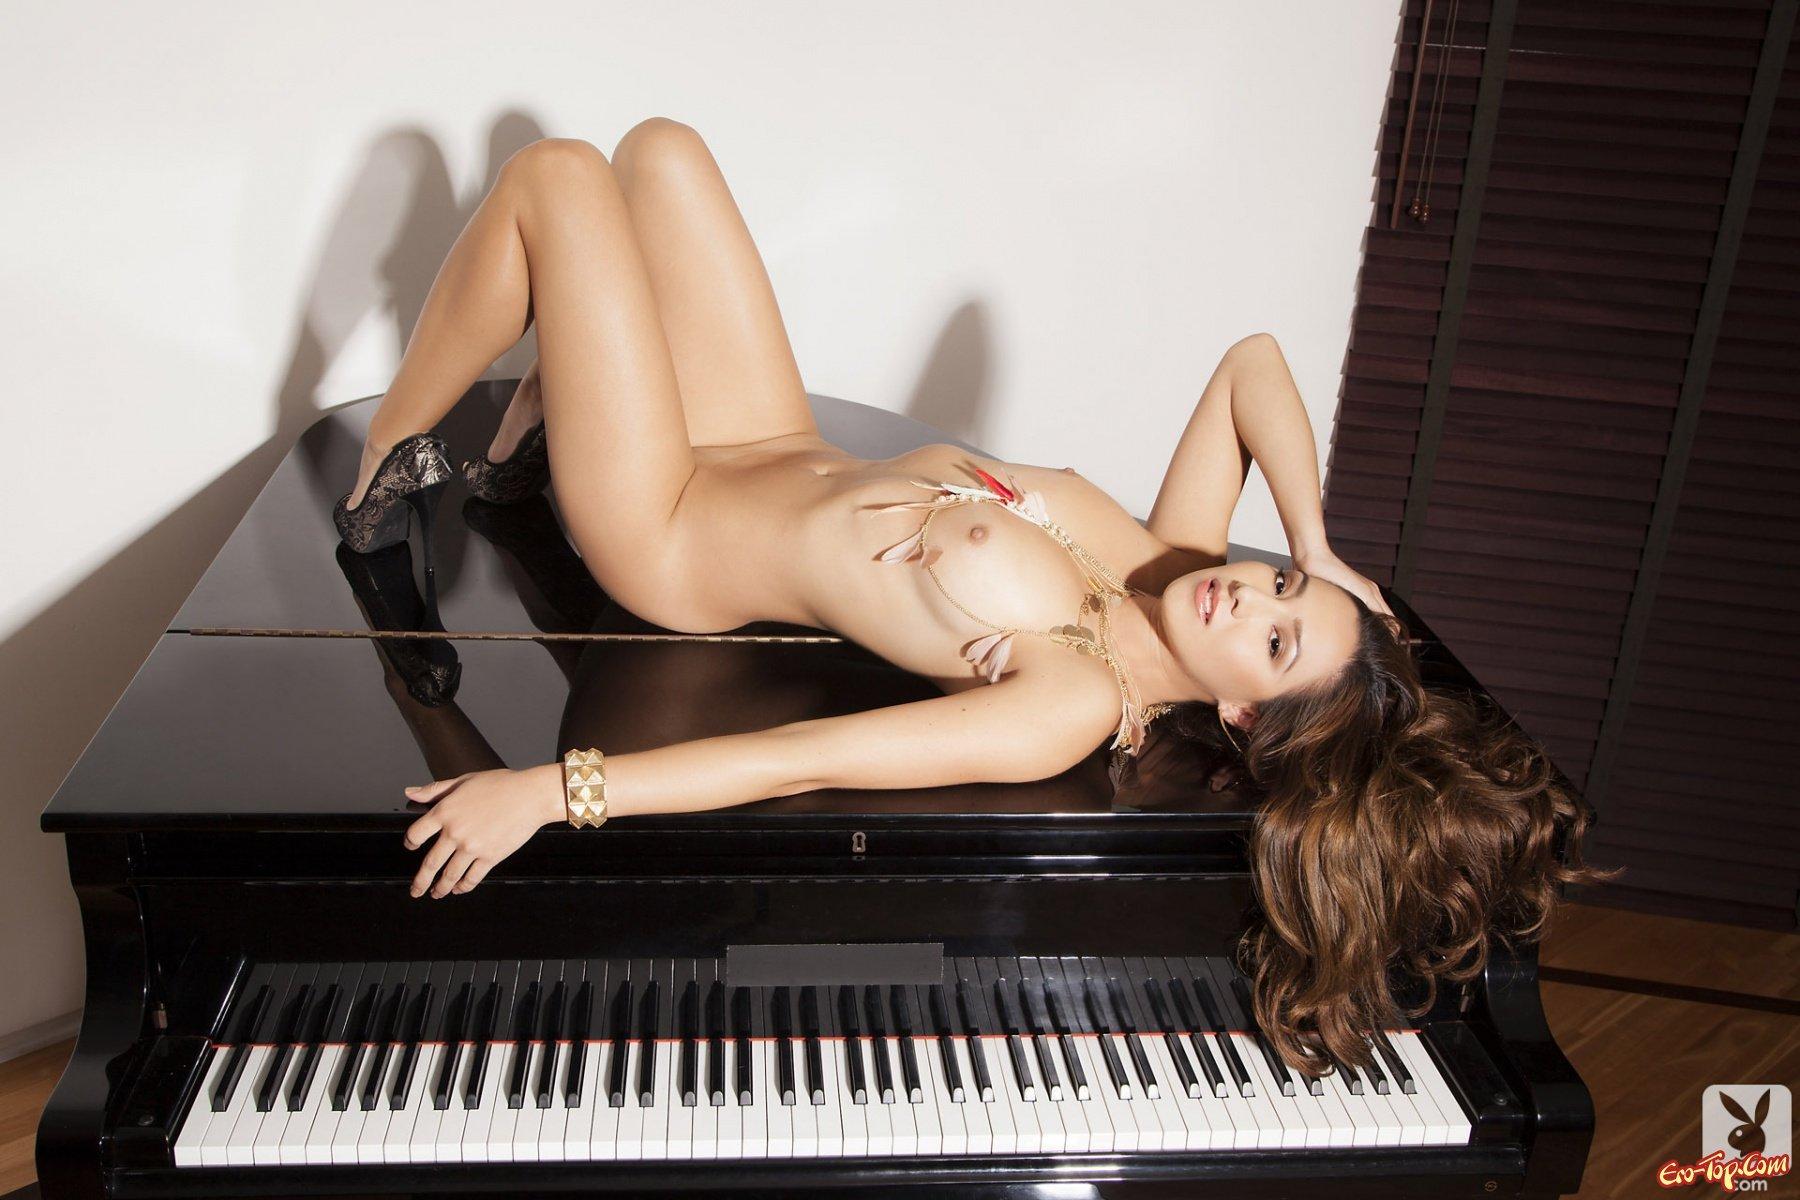 Секс на рояле картинки 10 фотография